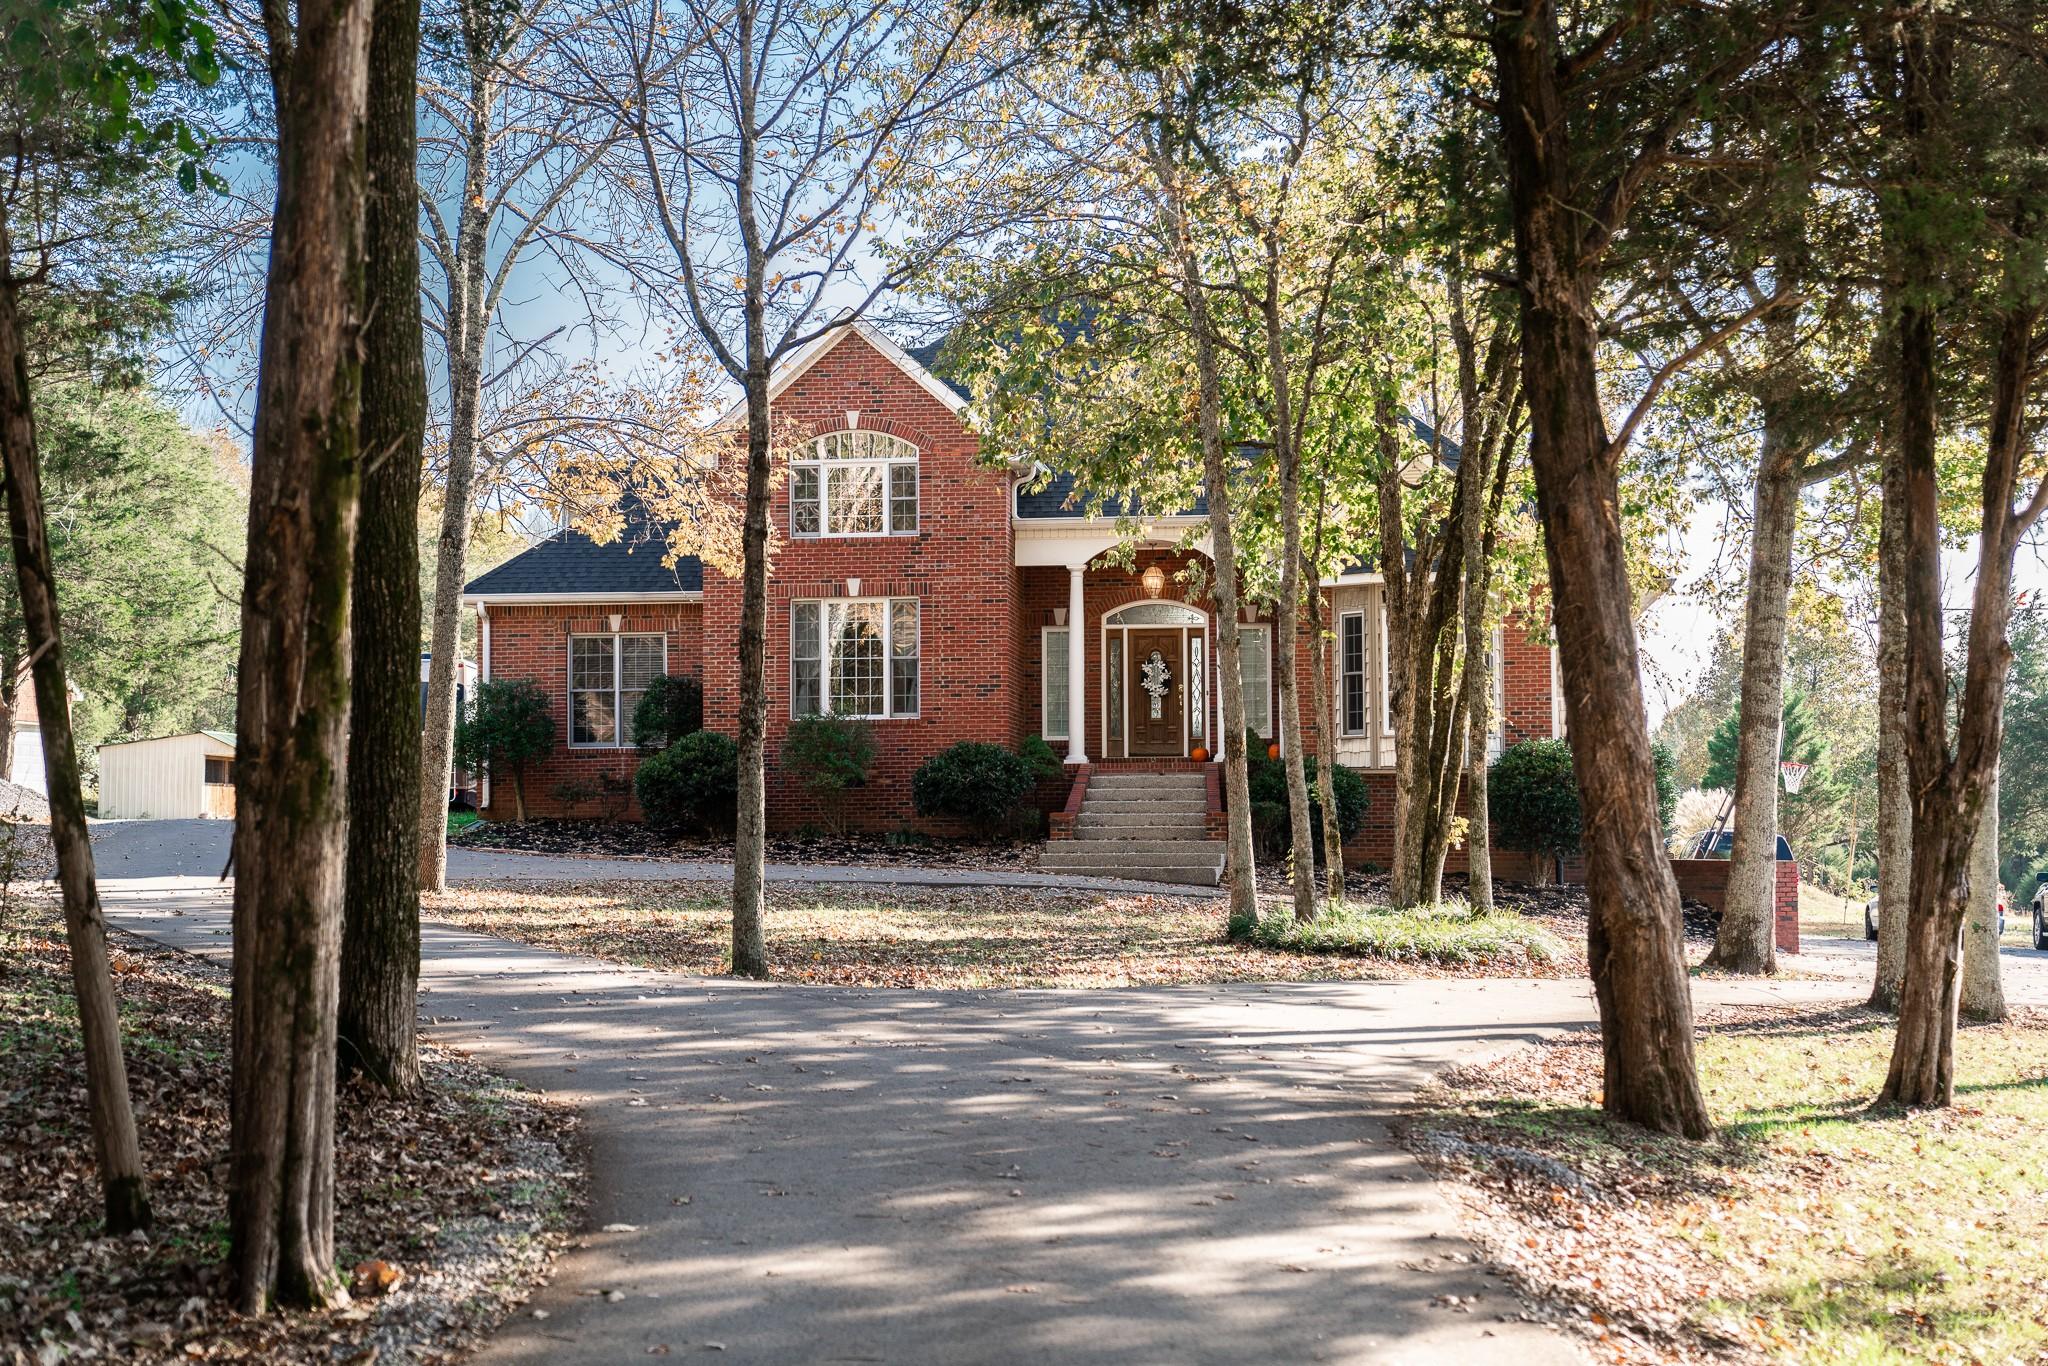 240 Sw Cook Rd, Mount Juliet, TN 37122 - Mount Juliet, TN real estate listing